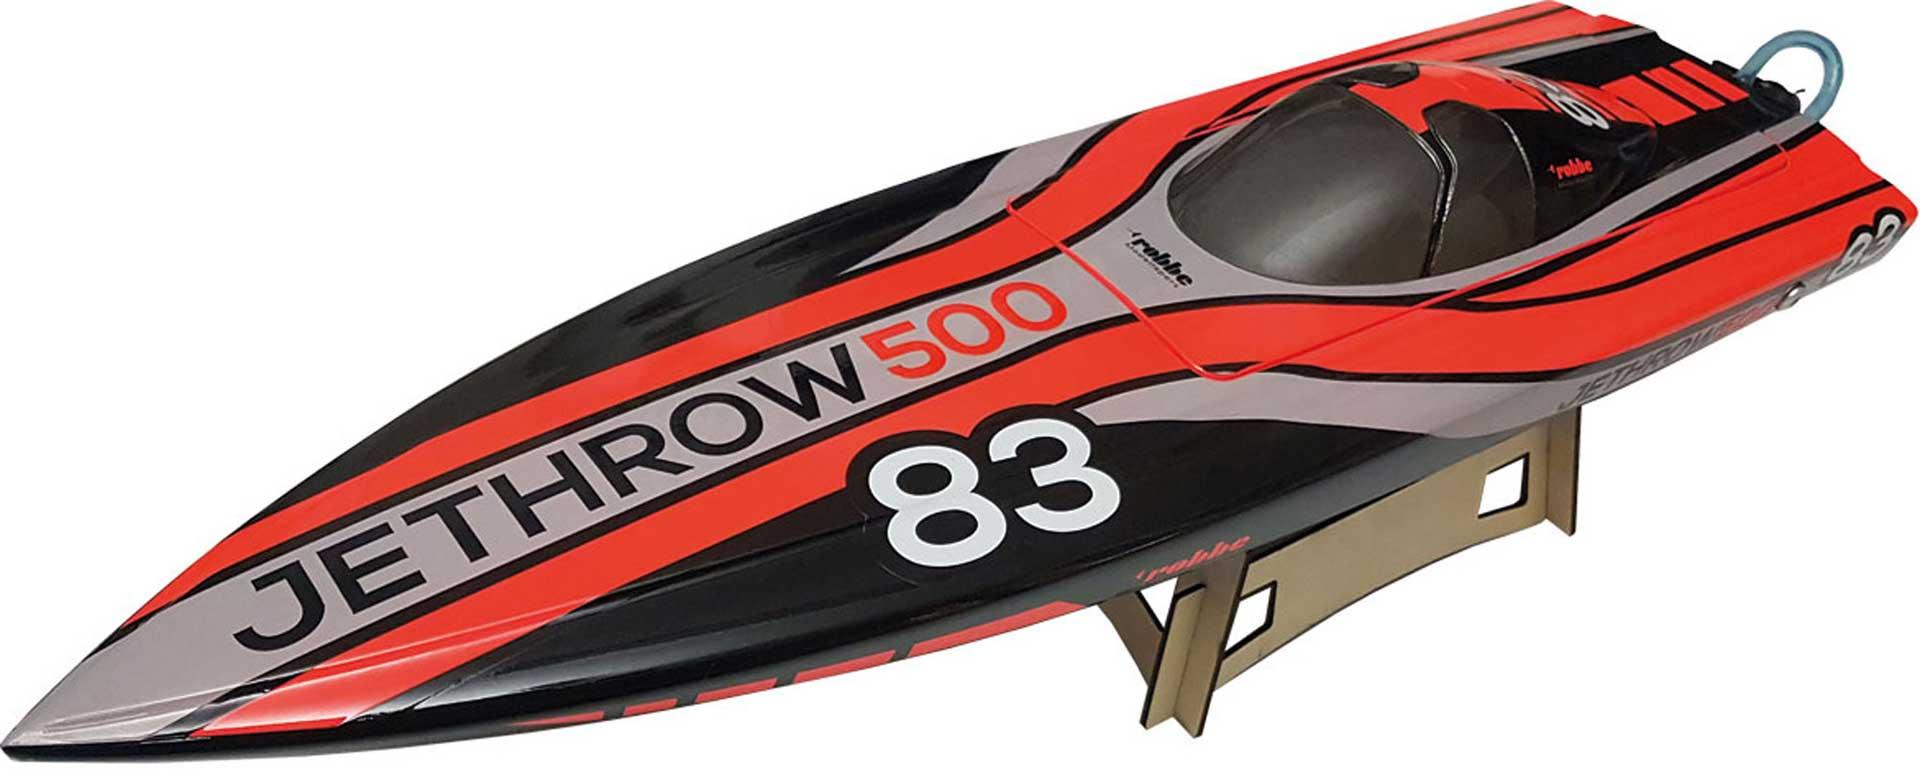 Robbe Modellsport JETHROW 500 ARTR BRUSHLESS SPEED BOOT MIT JETANTRIEB, REGLER, MOTOR, SERVO